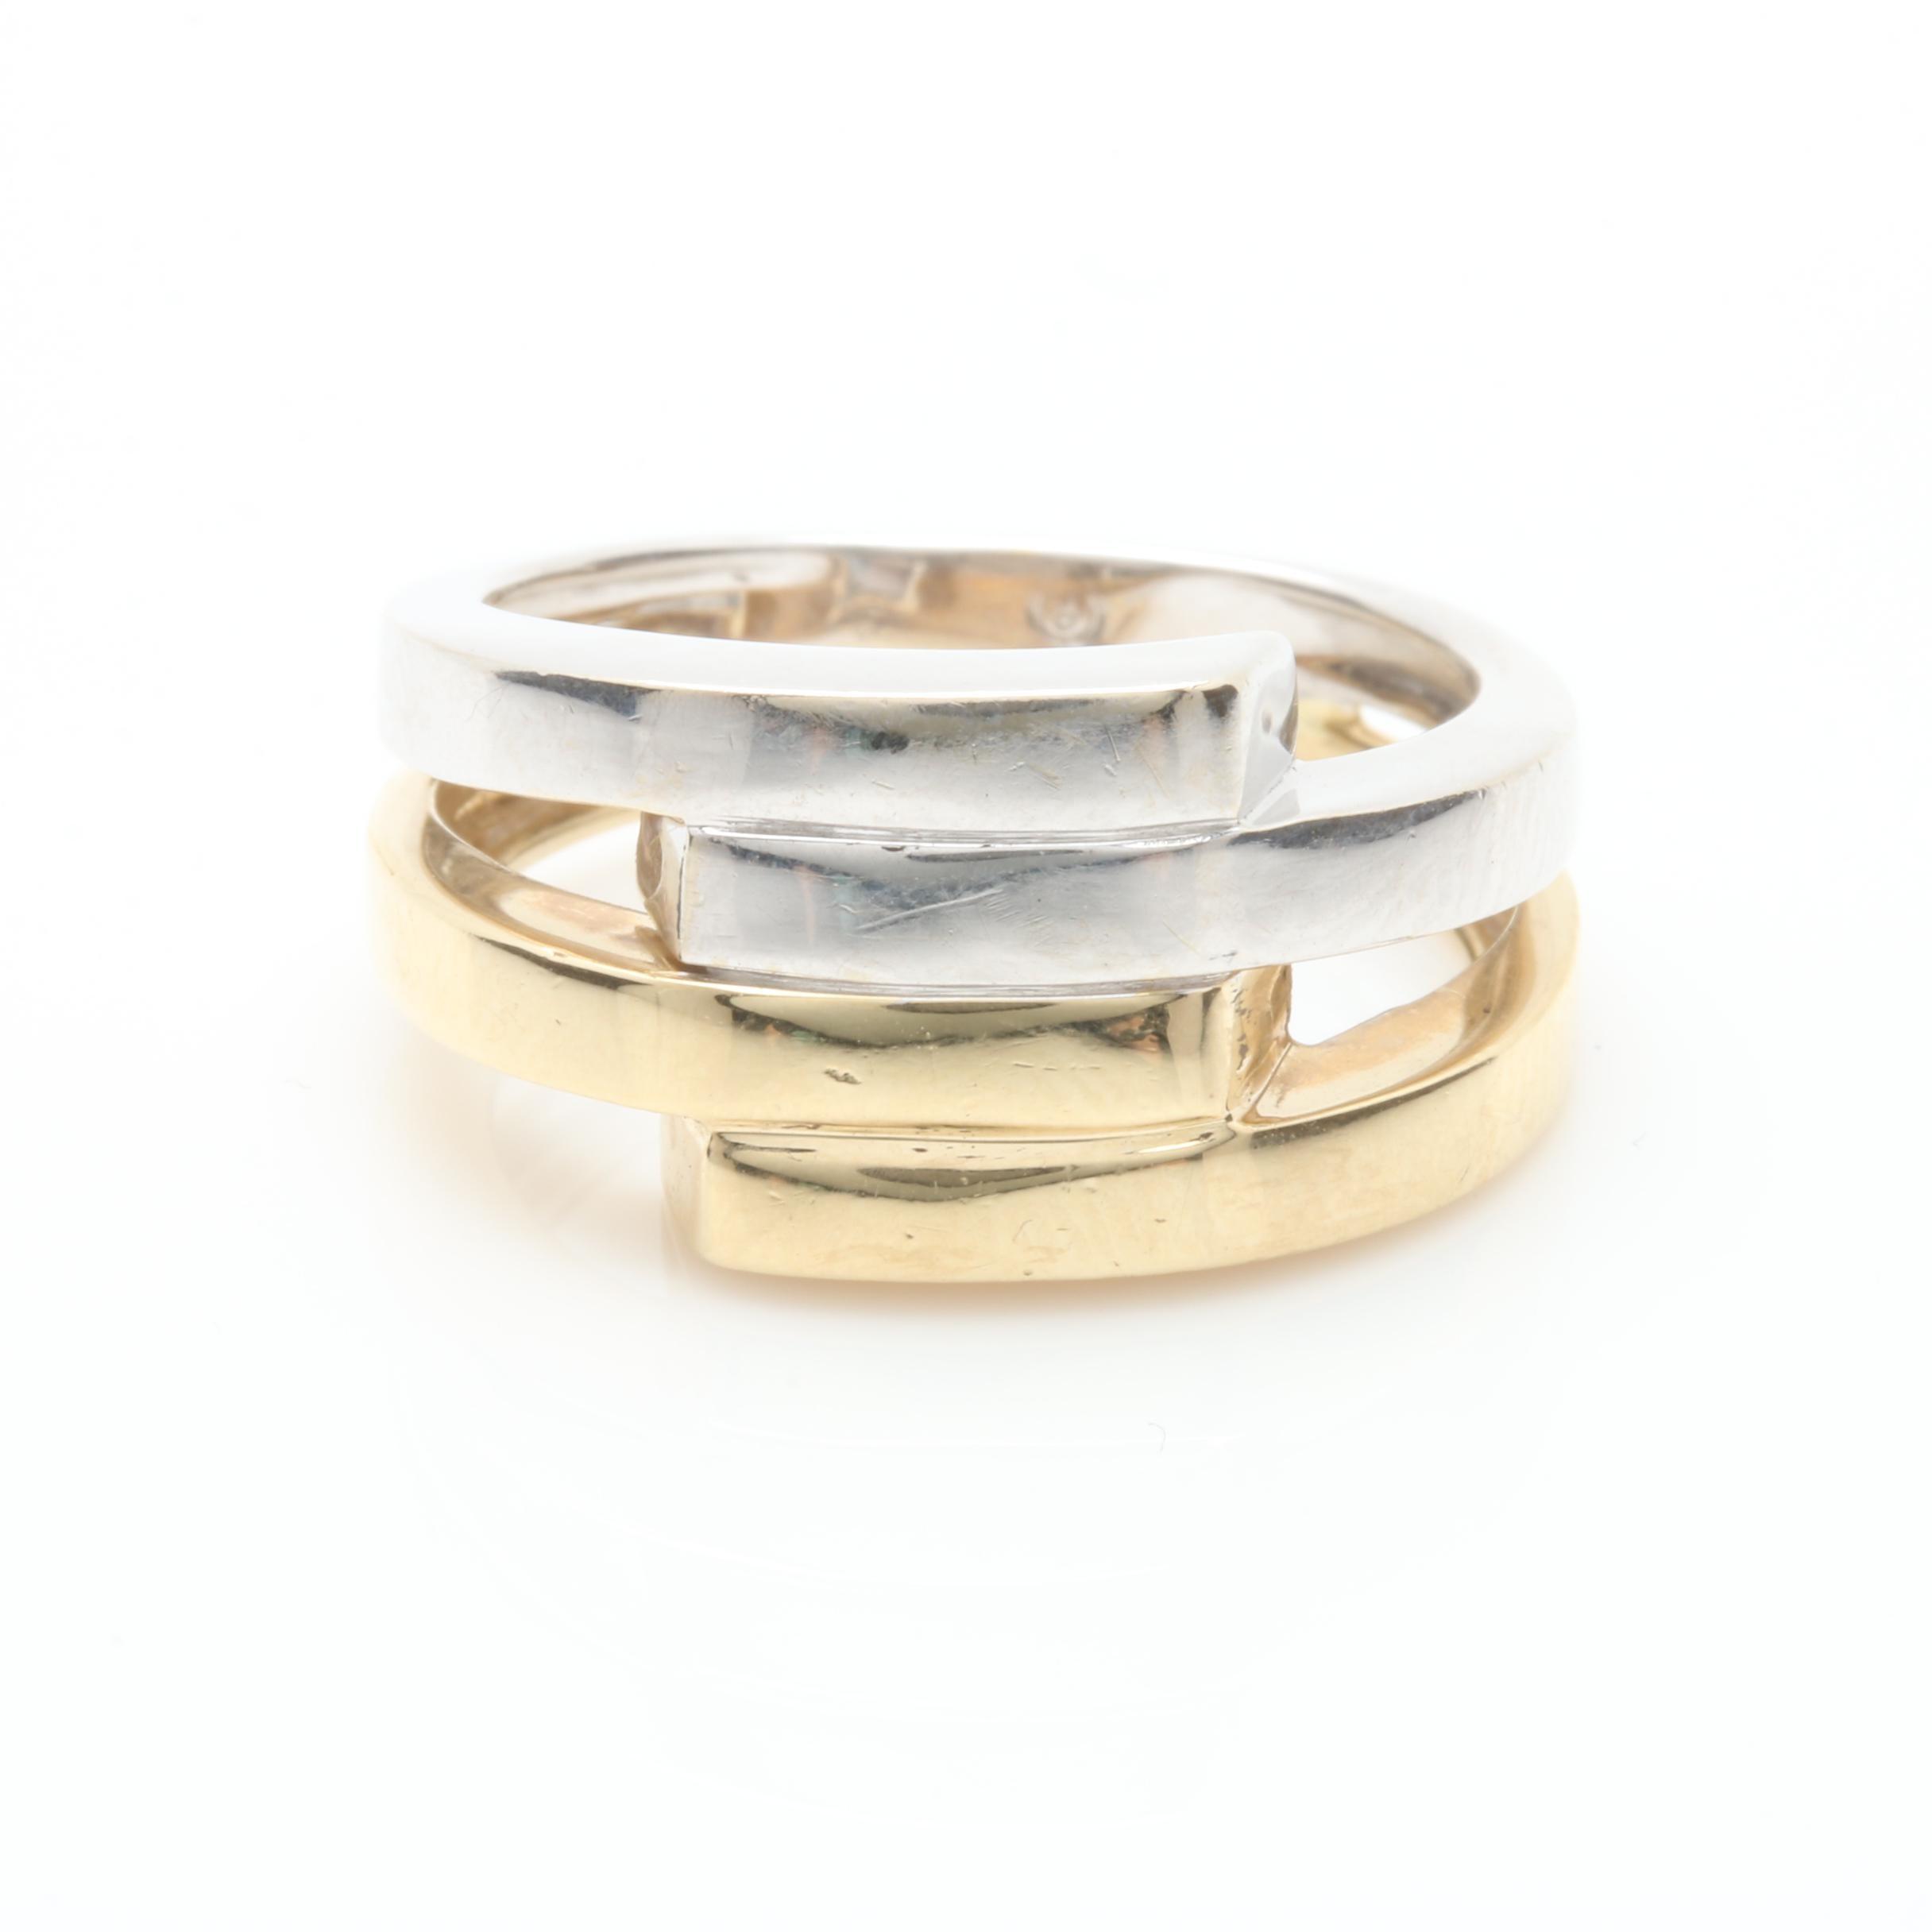 14K White and Yellow Gold Open Interlocking Ring